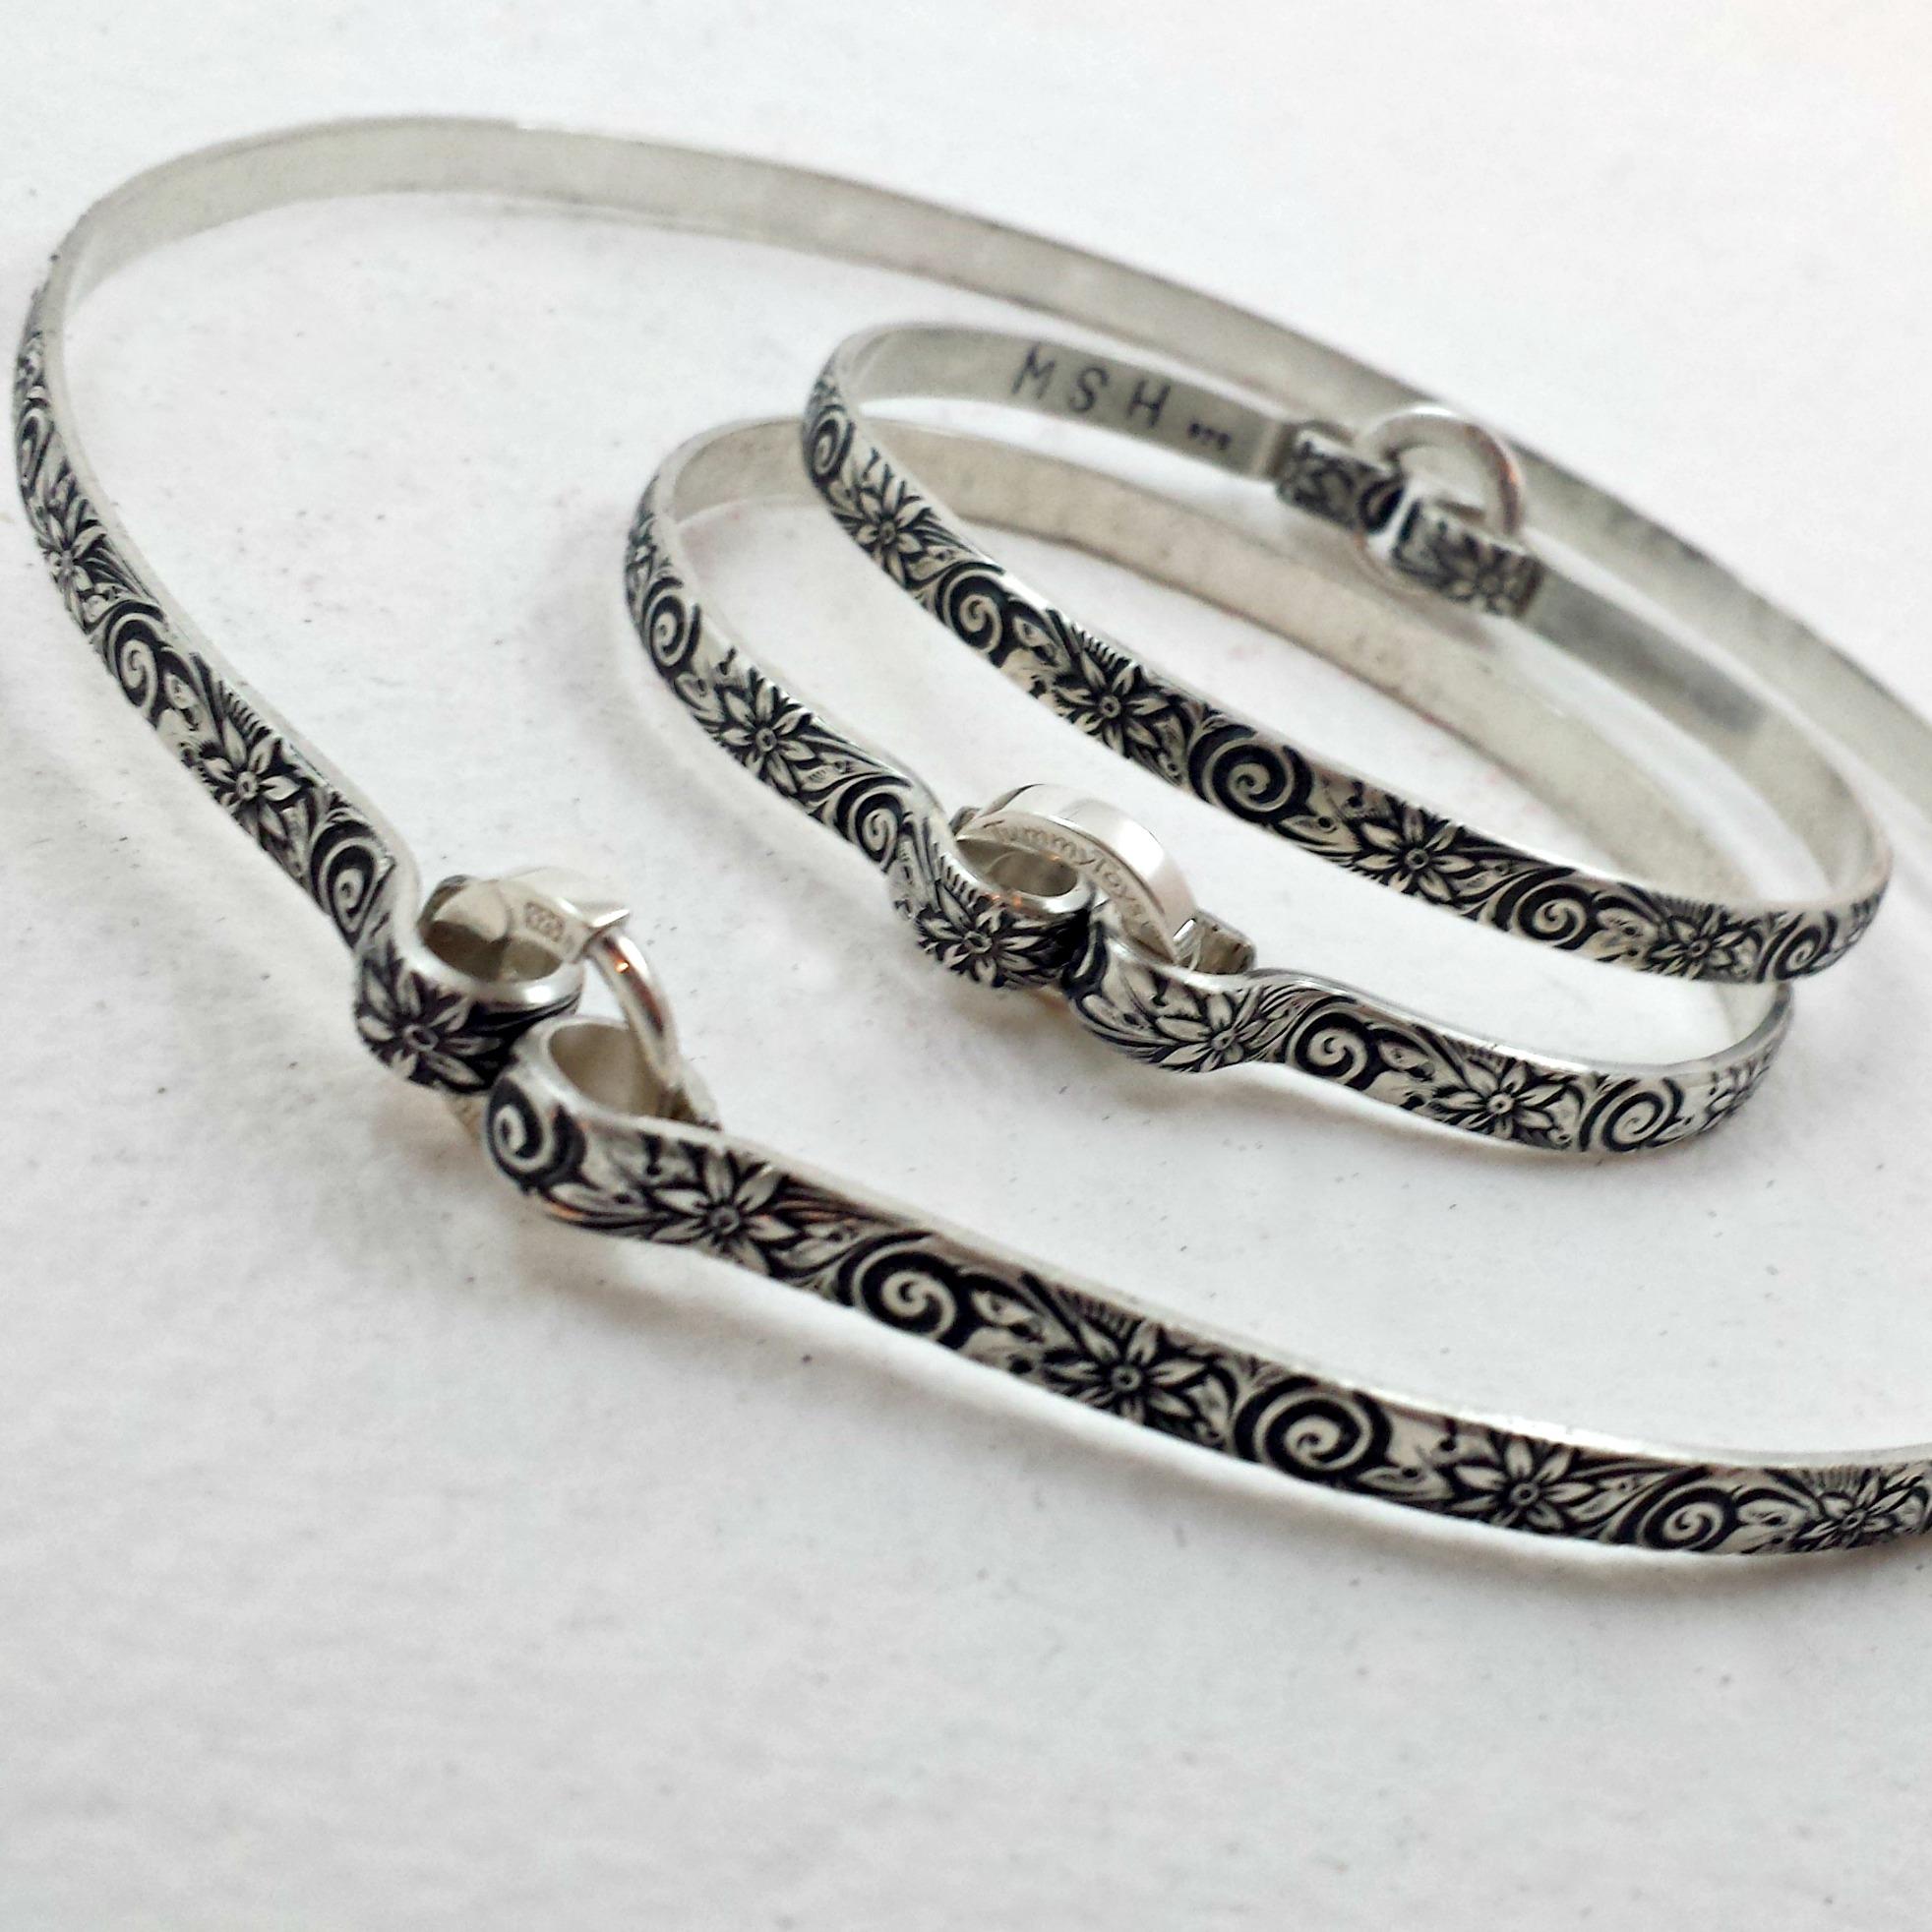 Locking Collar My Secret Heart Submissive Jewelry